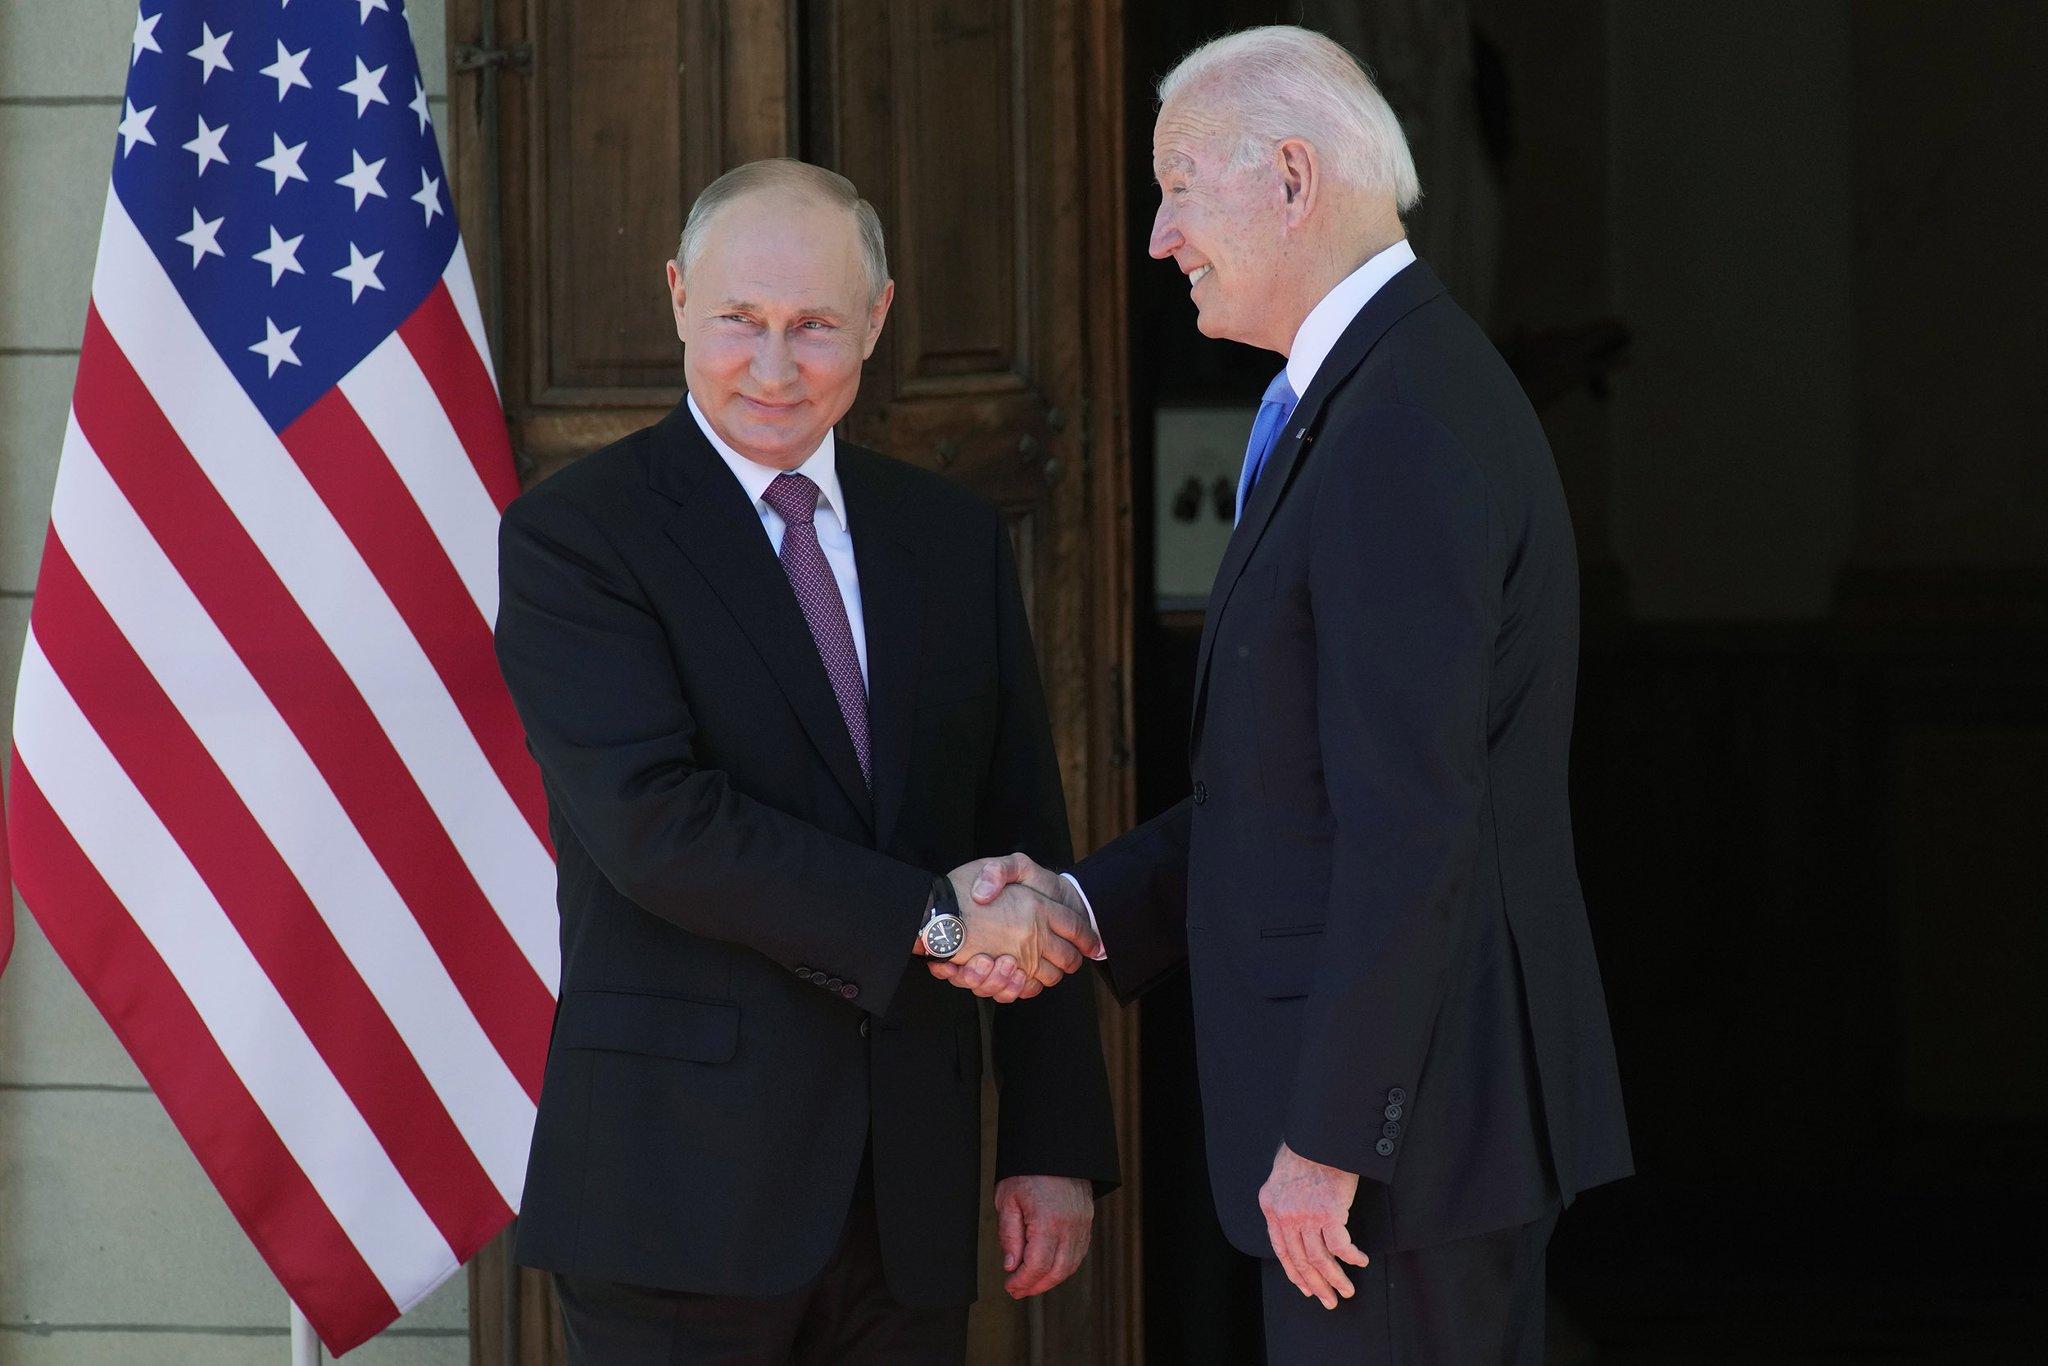 Biden and Putin set for long, tense summit in Geneva - cover